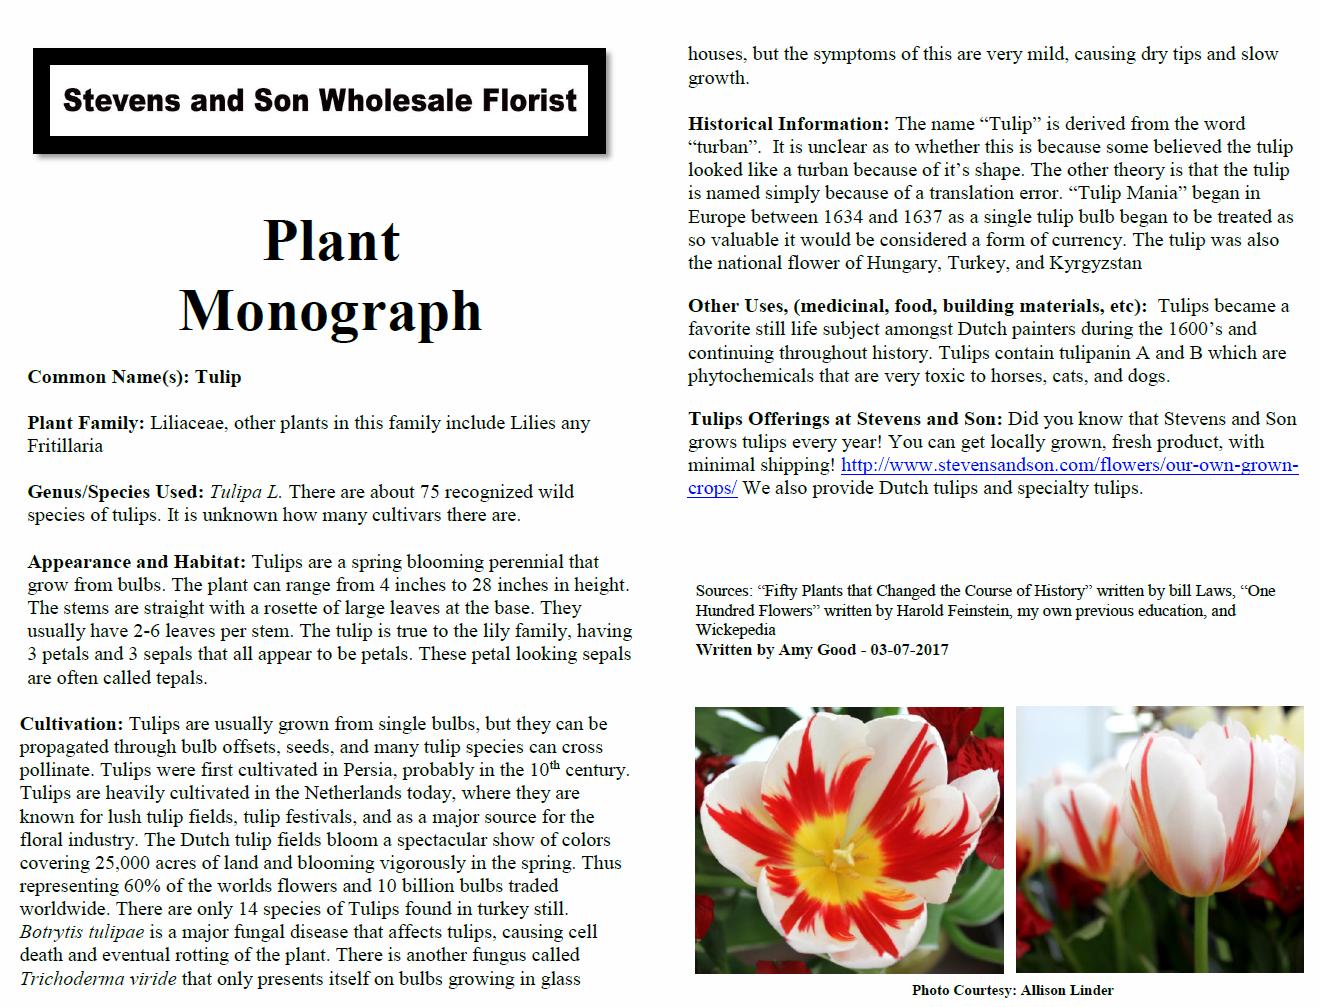 Tulip Plant Monograph